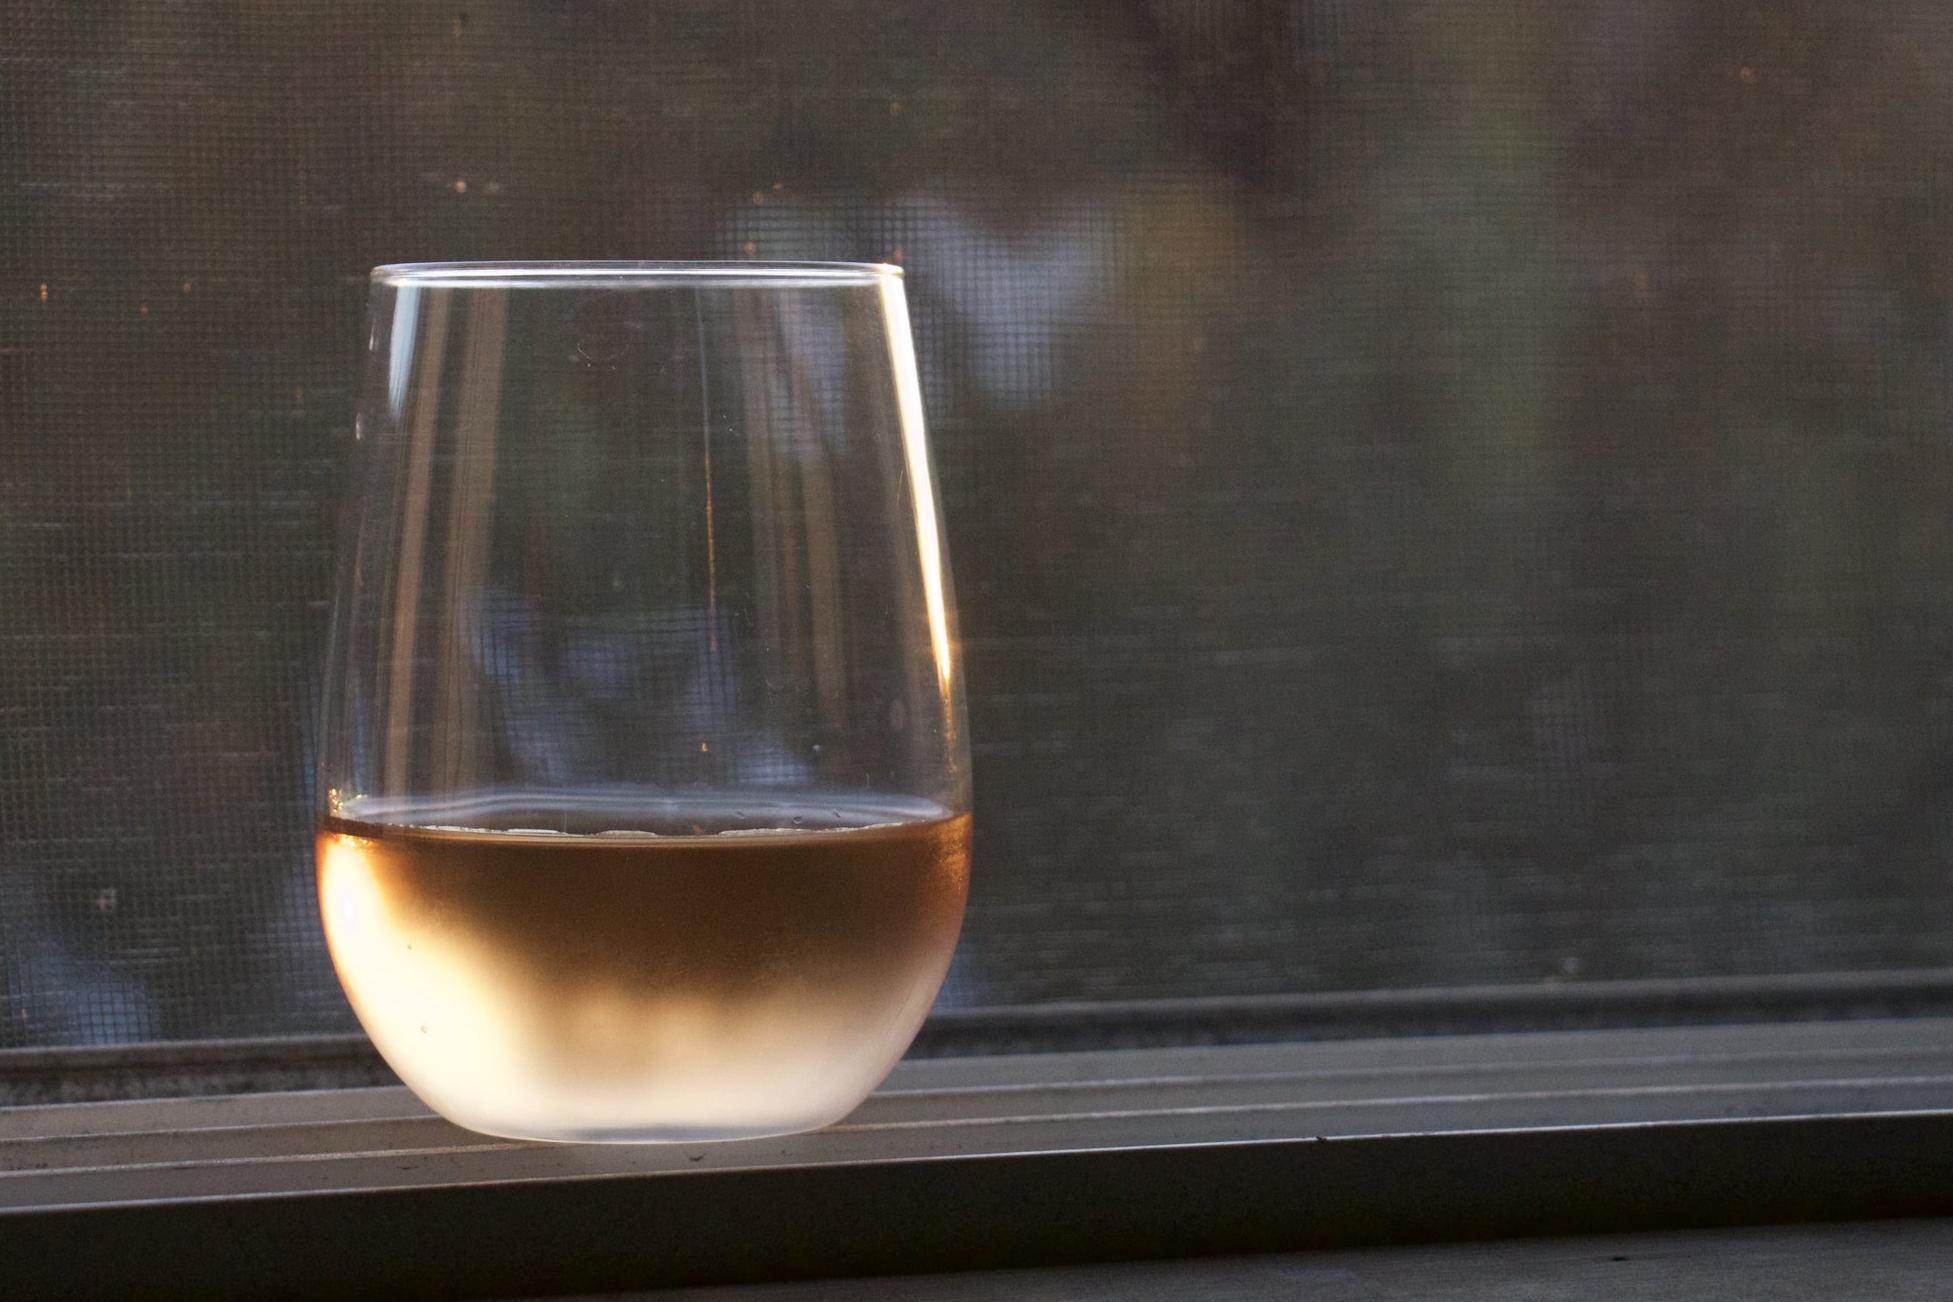 le pepin grenache rose trader joe's best wine review